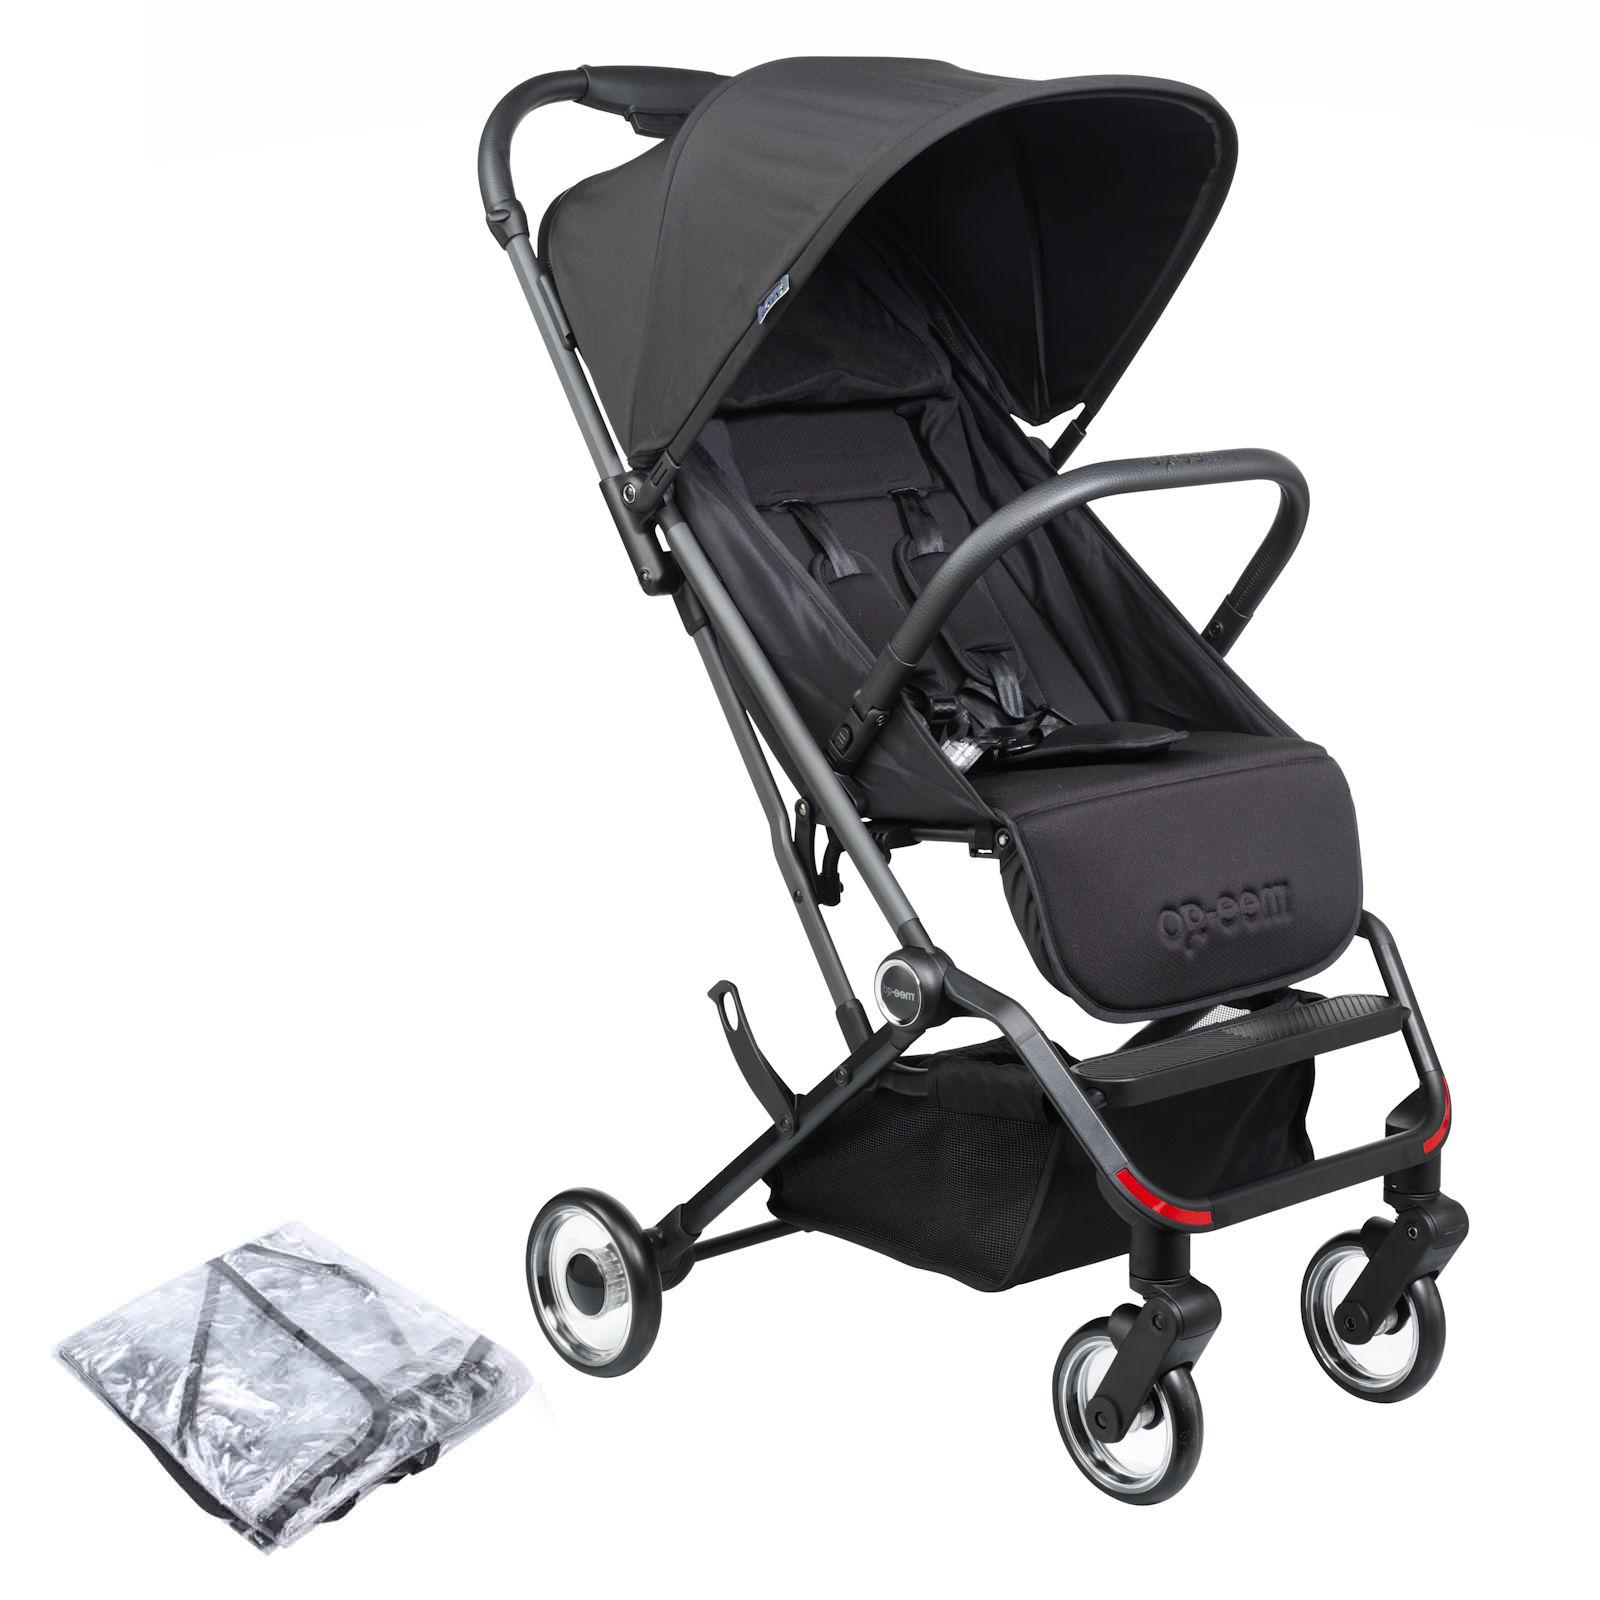 Mee-Go Trio Plus Pushchair Stroller - Jet